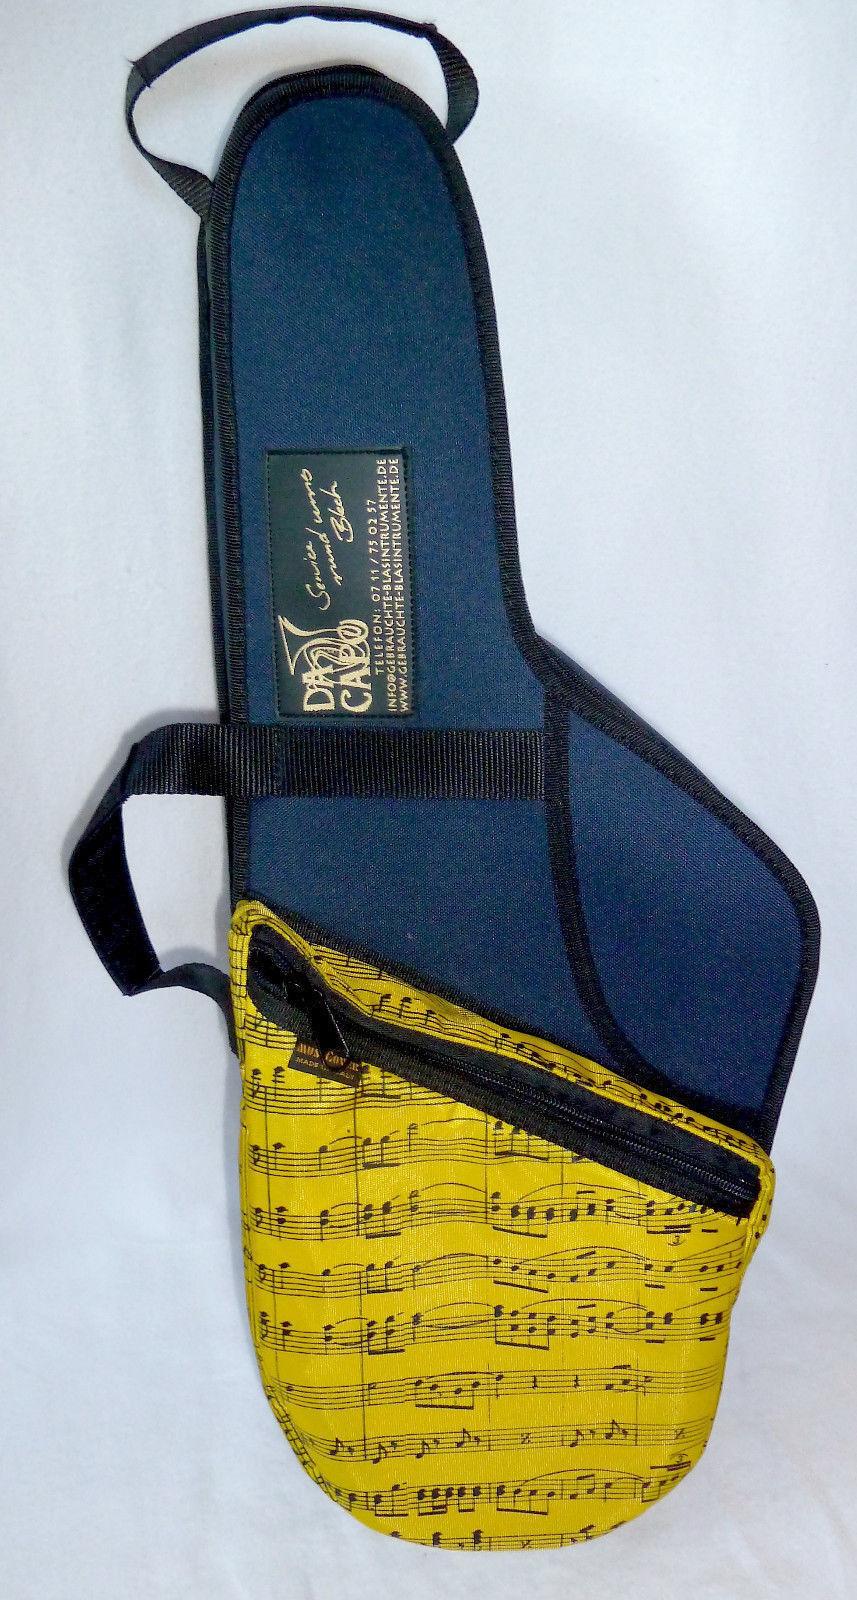 Gig-Bag Tasche Altsaxophon Alto Saxophono Fa. MusiCover Italien handgefertigt